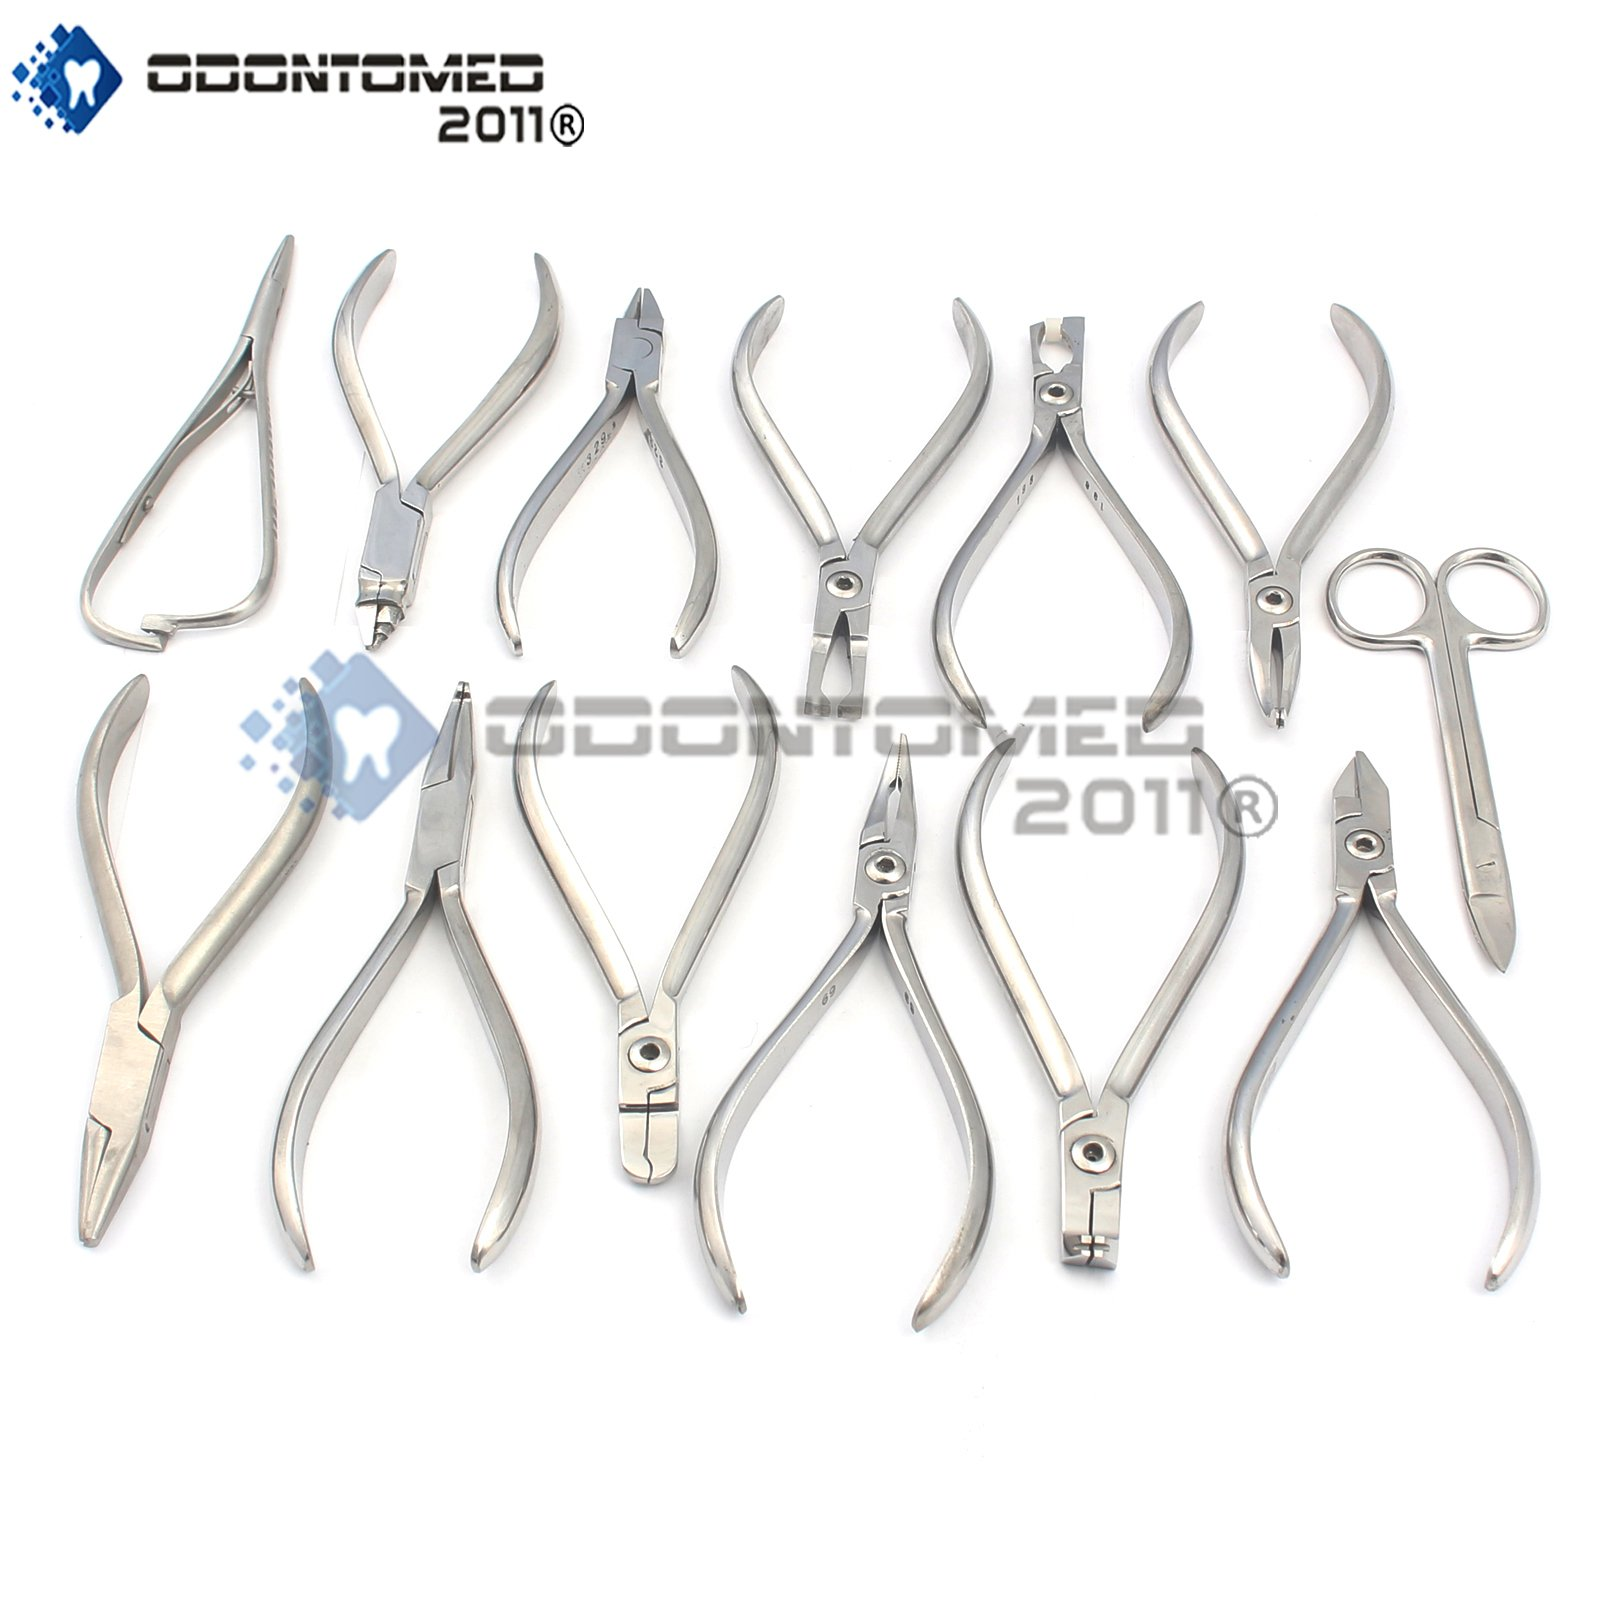 OdontoMed2011 Set of 13 Orthodontics SCISORS Bracket Holder Wire Bender Pliers ODM by OdontoMed2011 (Image #1)